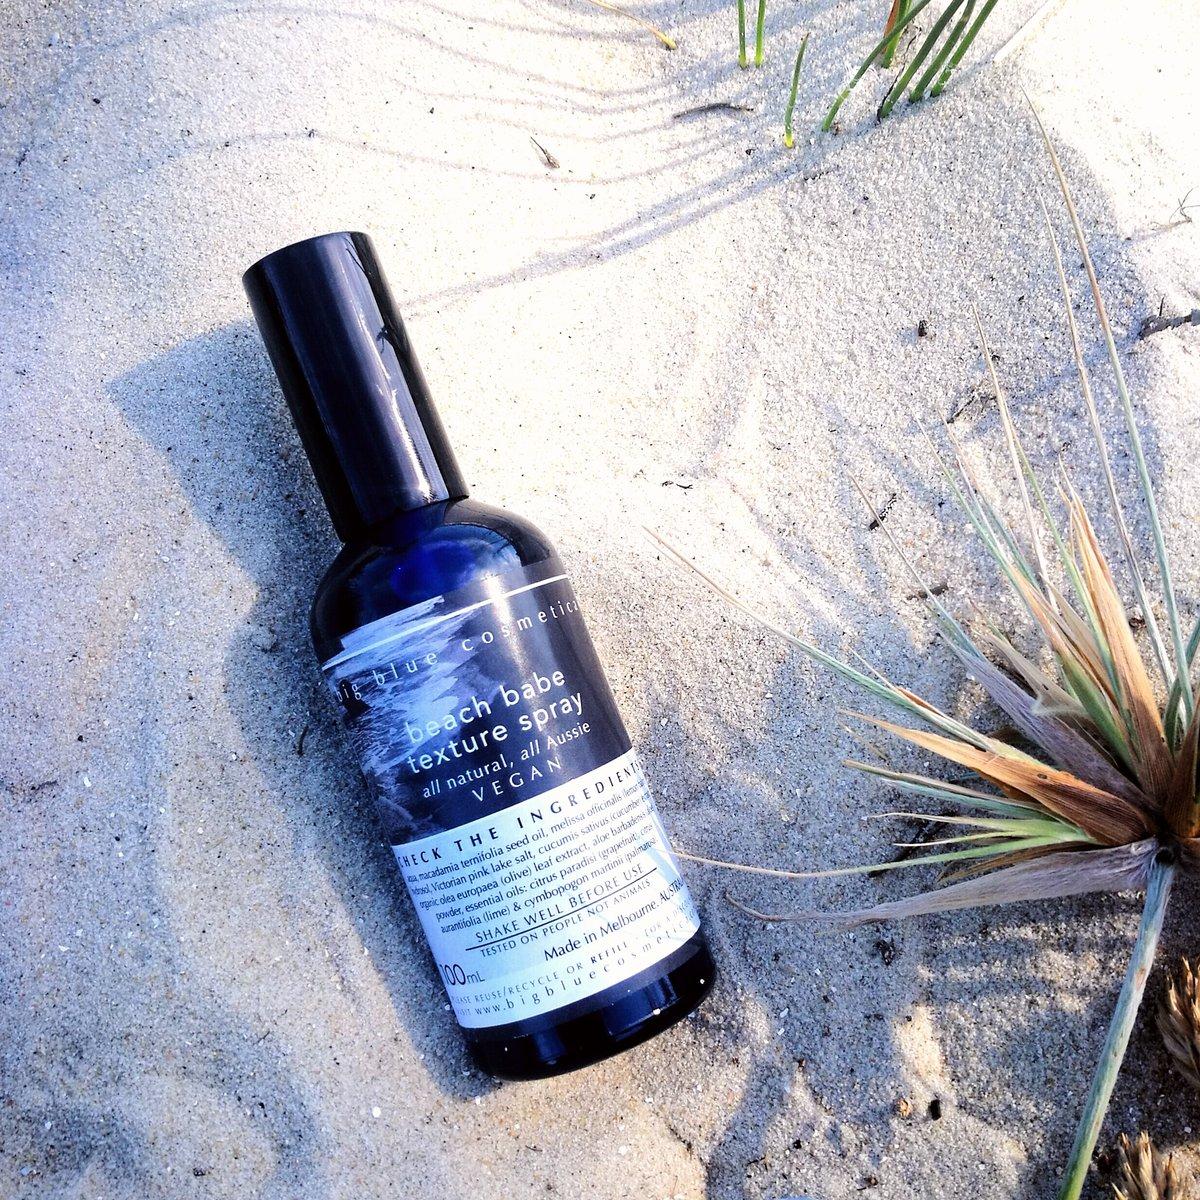 Image of beach babe texture spray